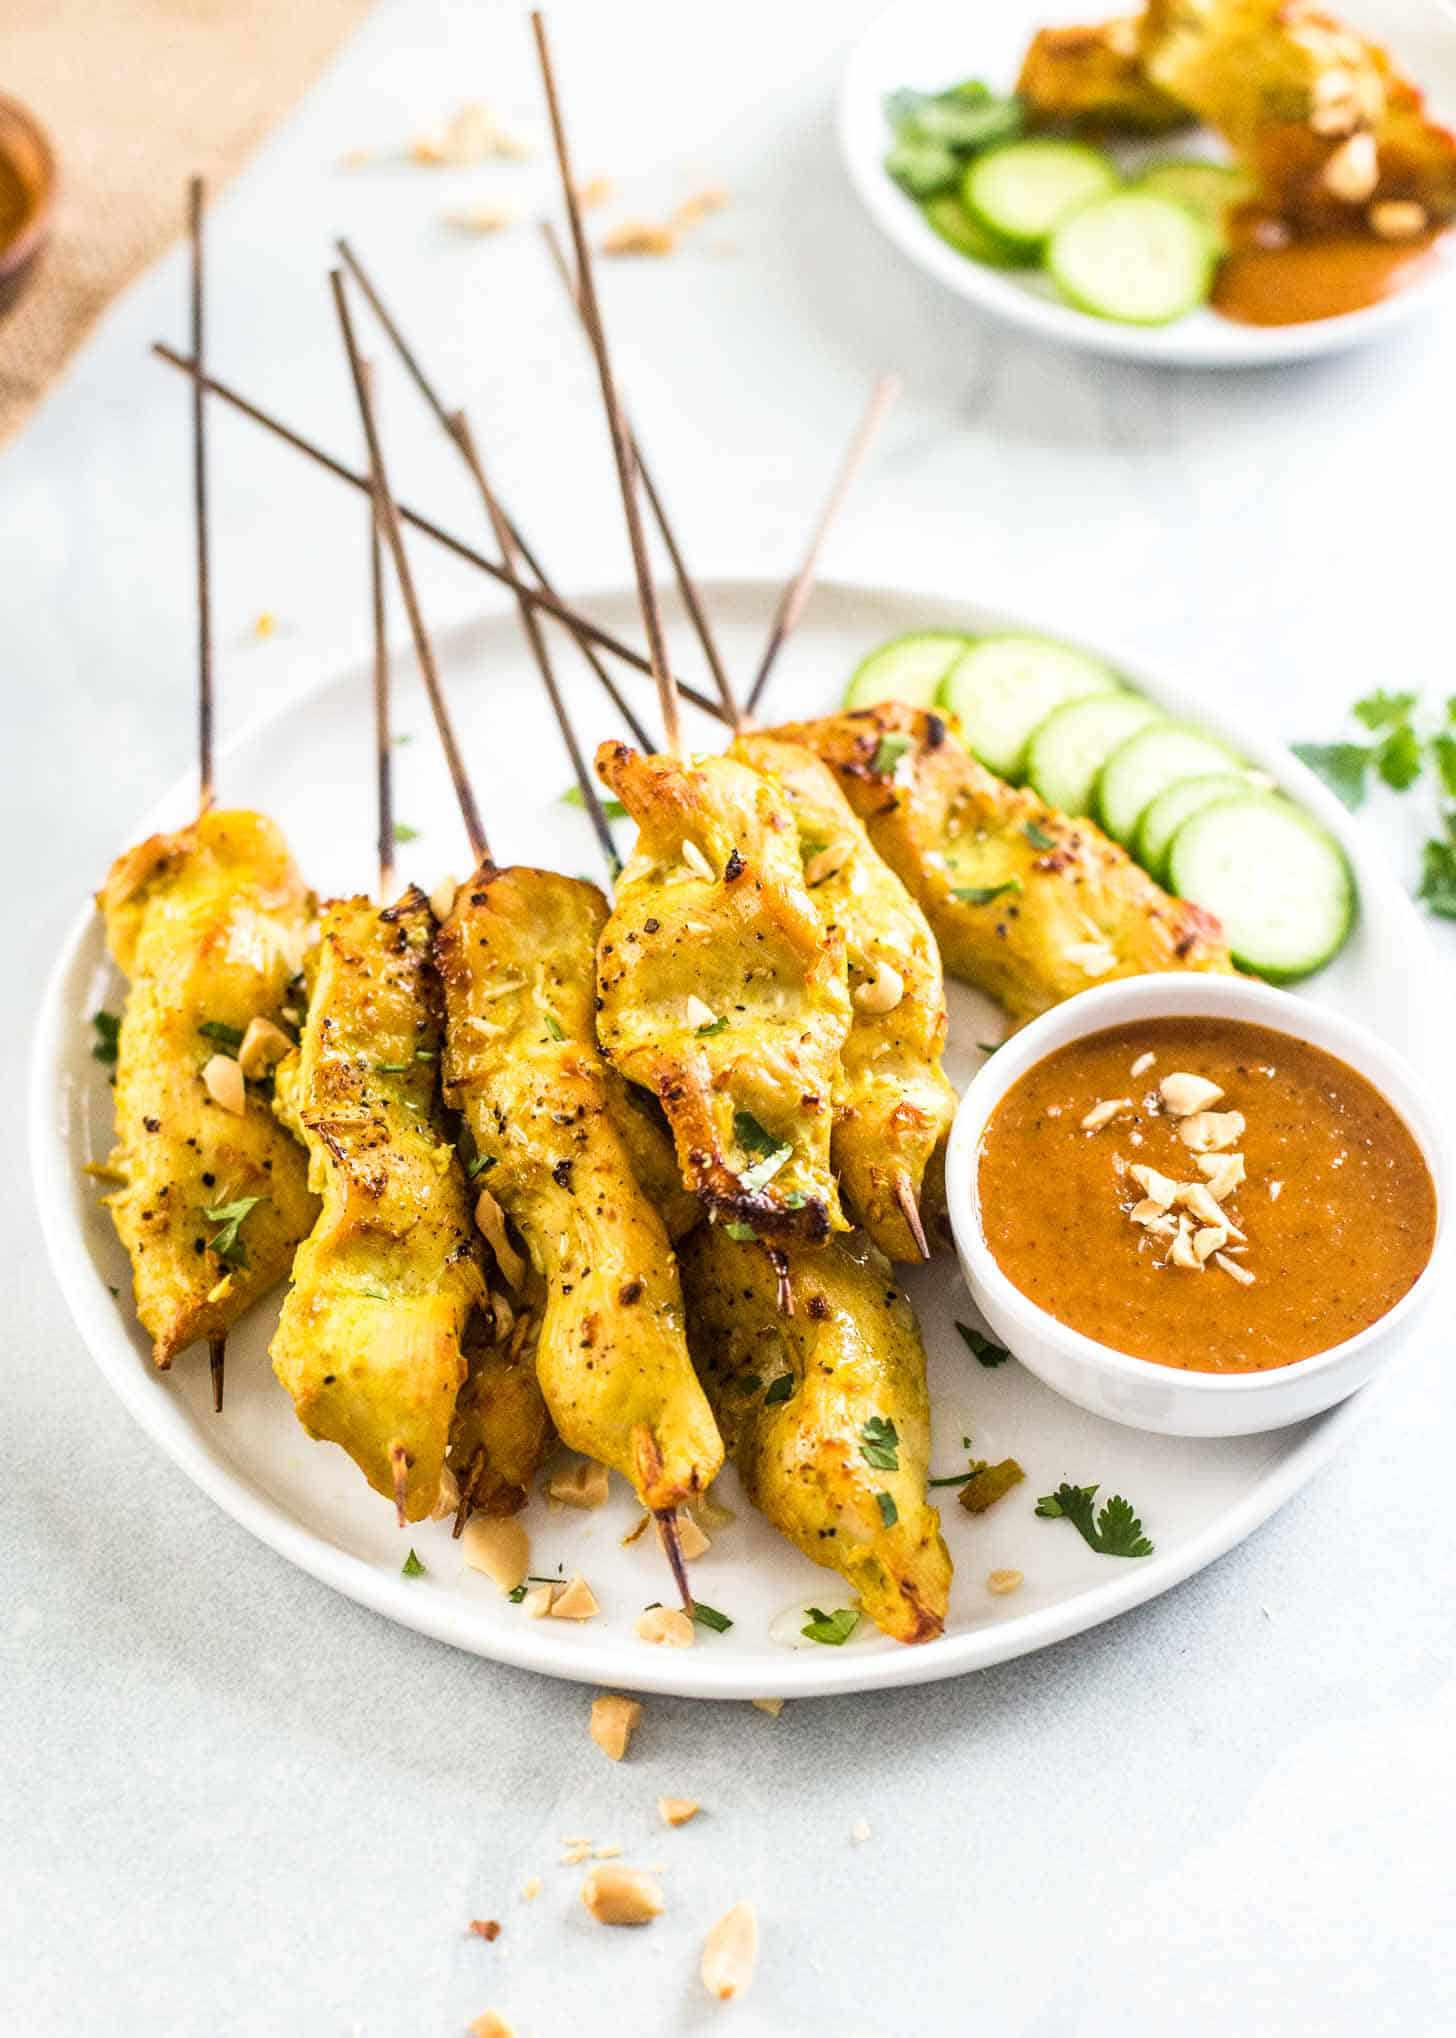 Thai Chicken Satay on a plate